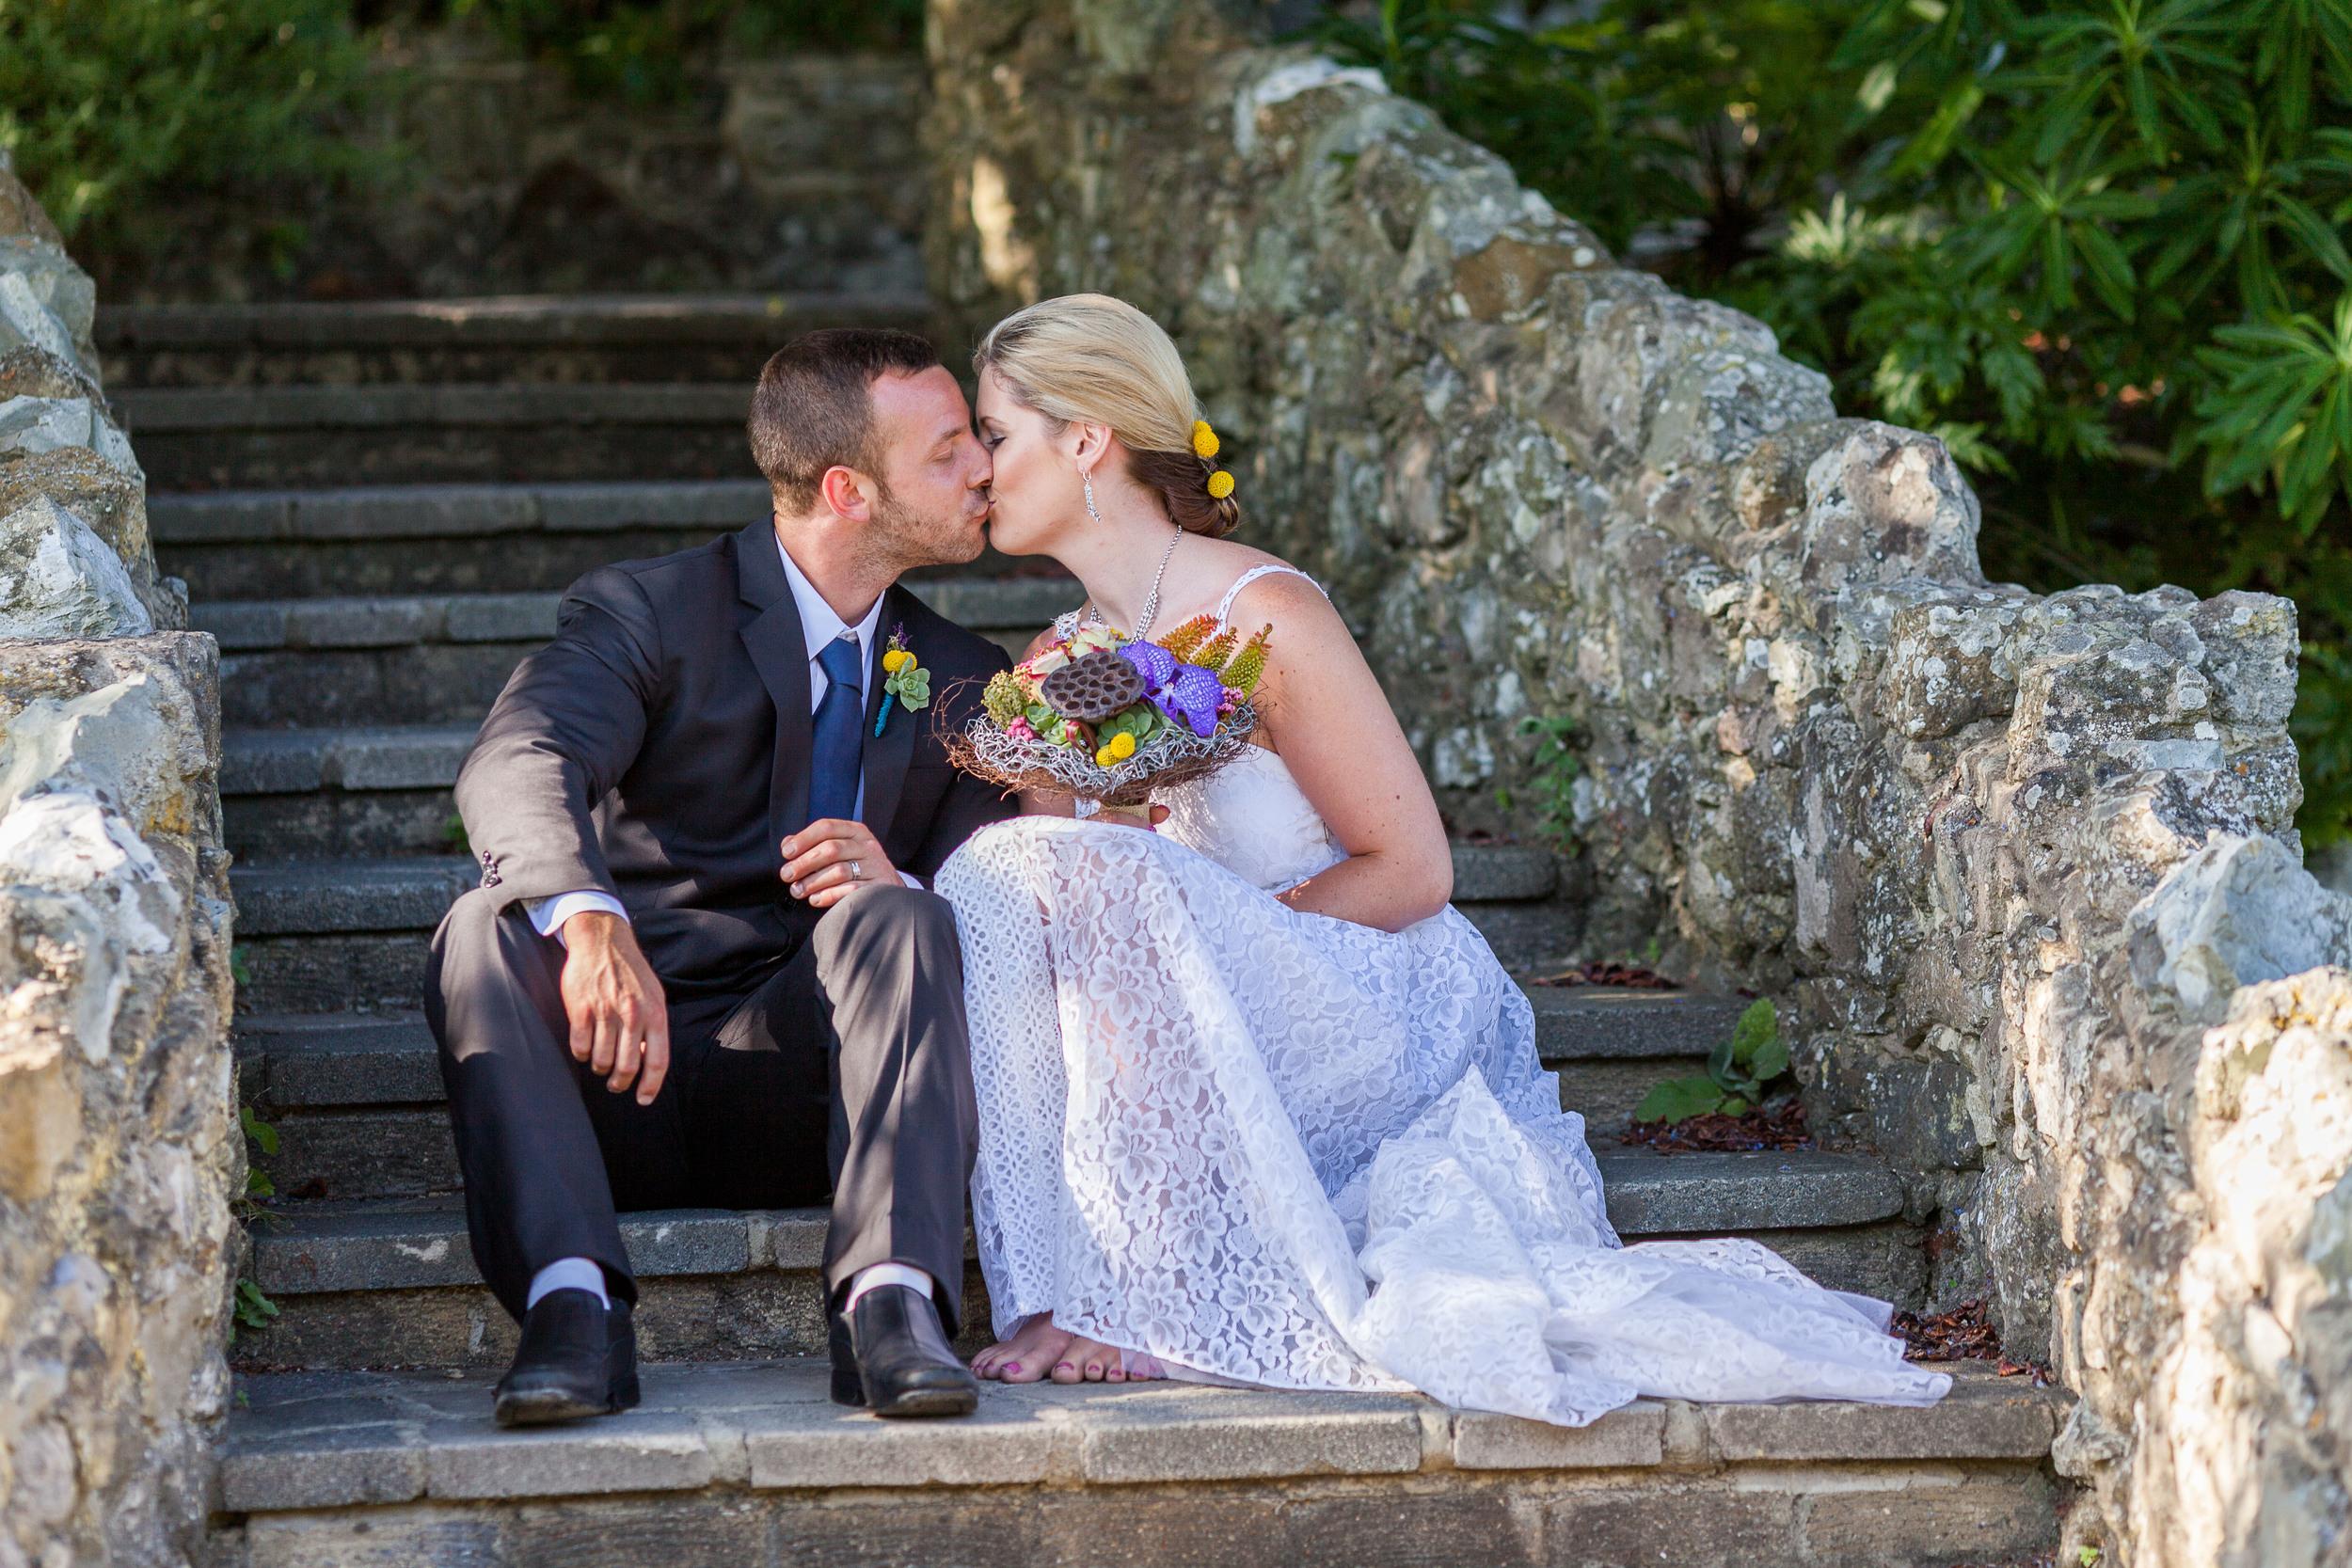 ethical-wedding-VBG-chris-cowley-136.jpg